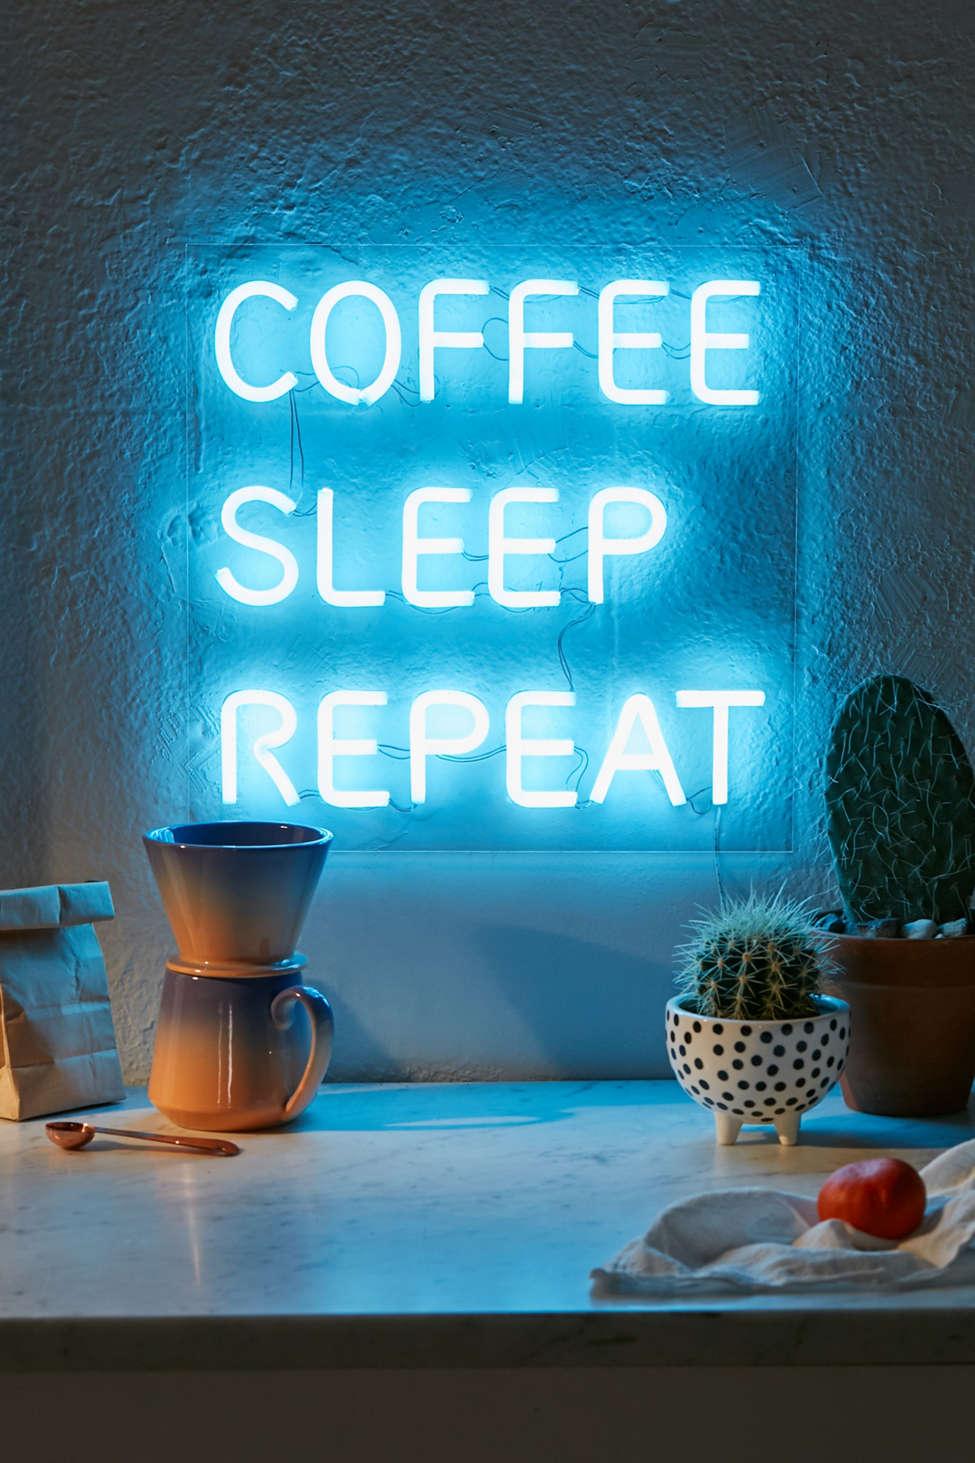 Slide View: 1: Coffee, Sleep, Repeat LED Neon Sign